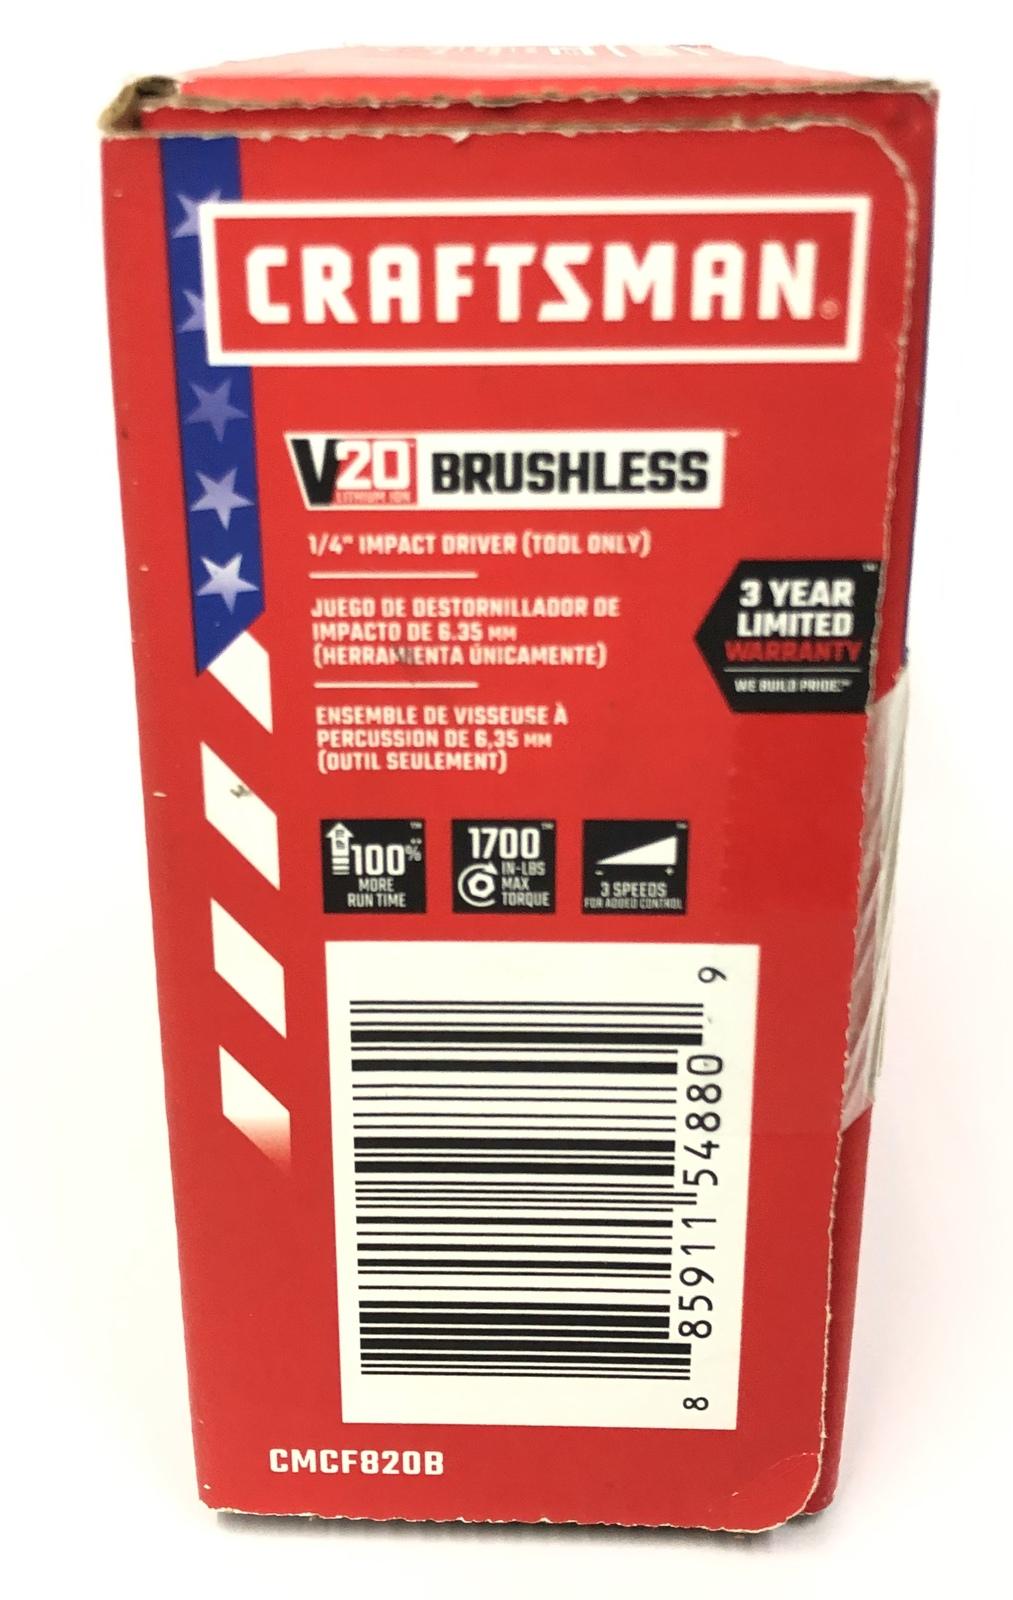 Craftsman Cordless Hand Tools Cmcf820b image 4